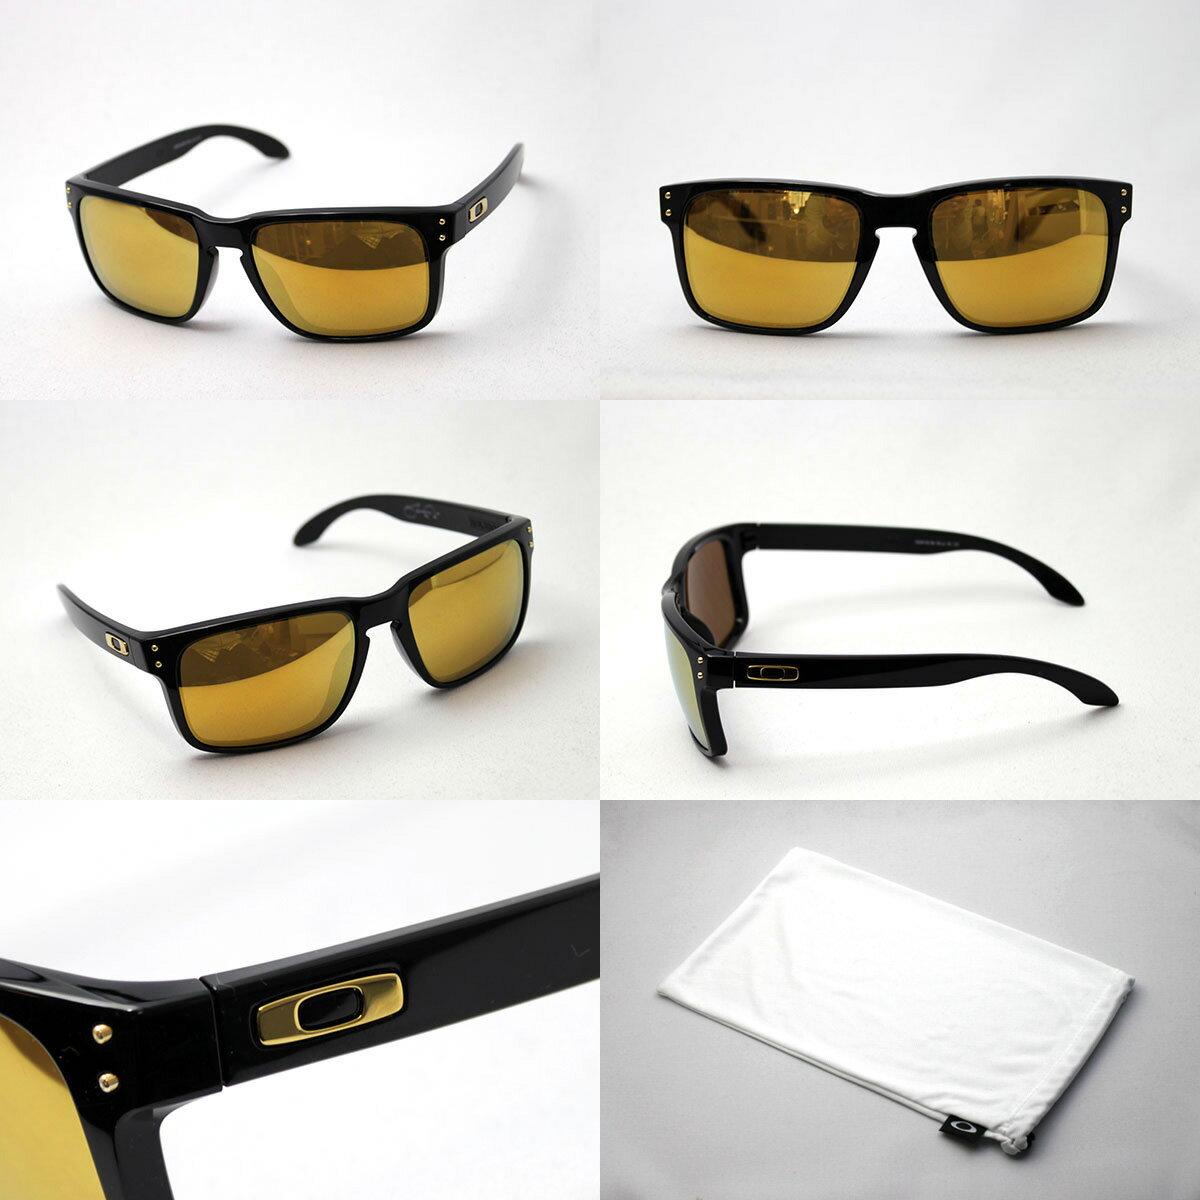 oakley holbrook sunglasses south africa  oakley holbrook sunglasses south africa